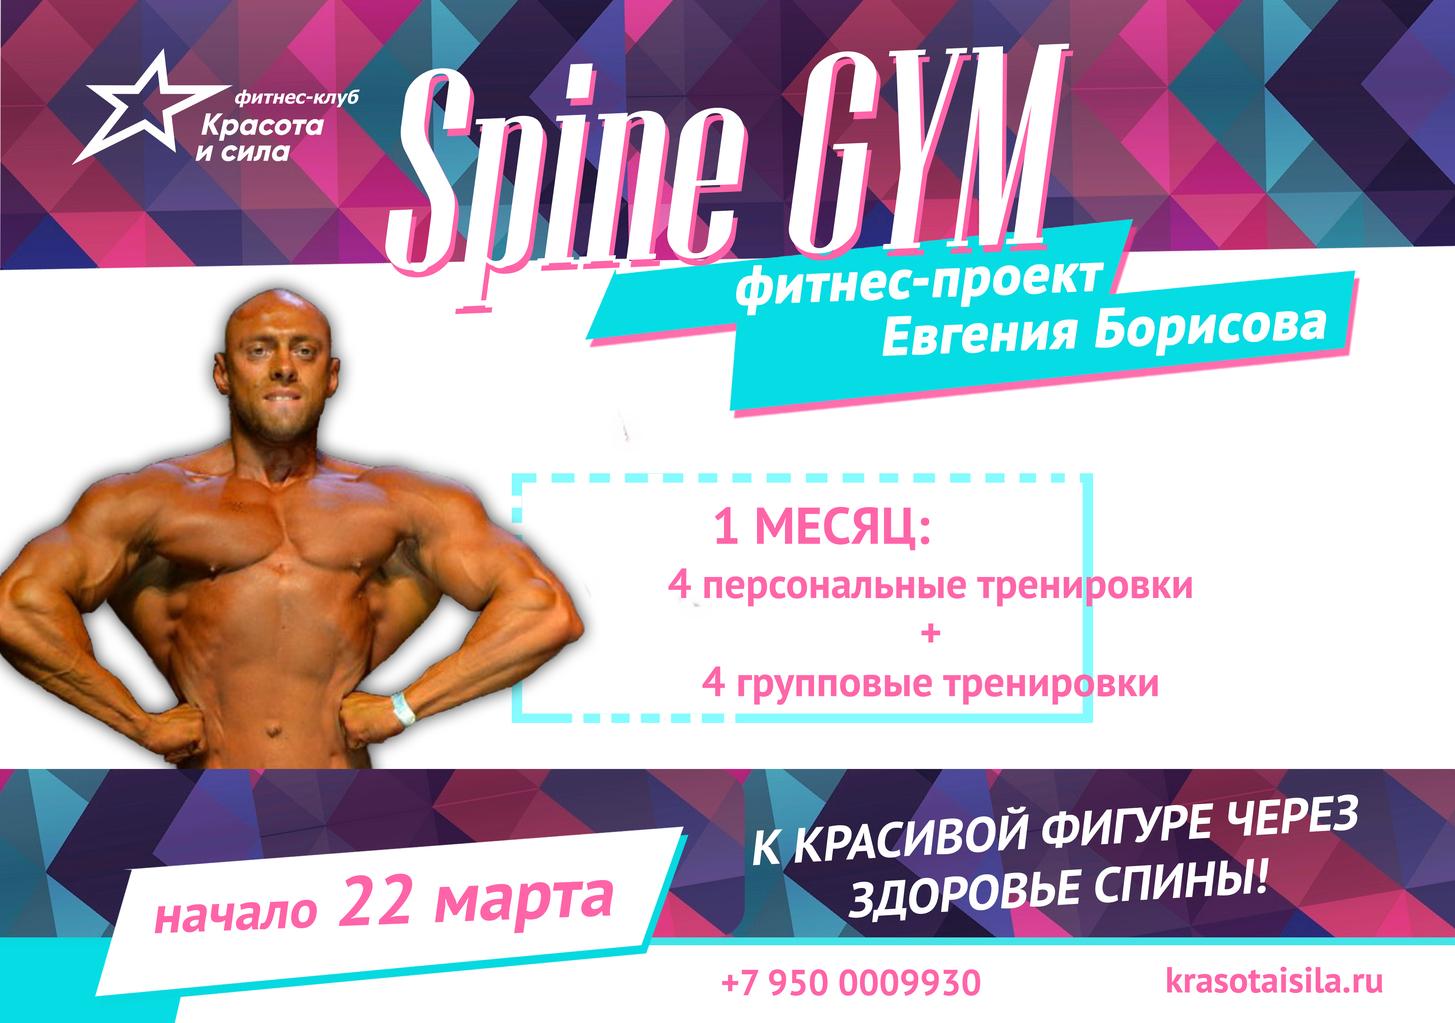 Spine GYM печать.jpg